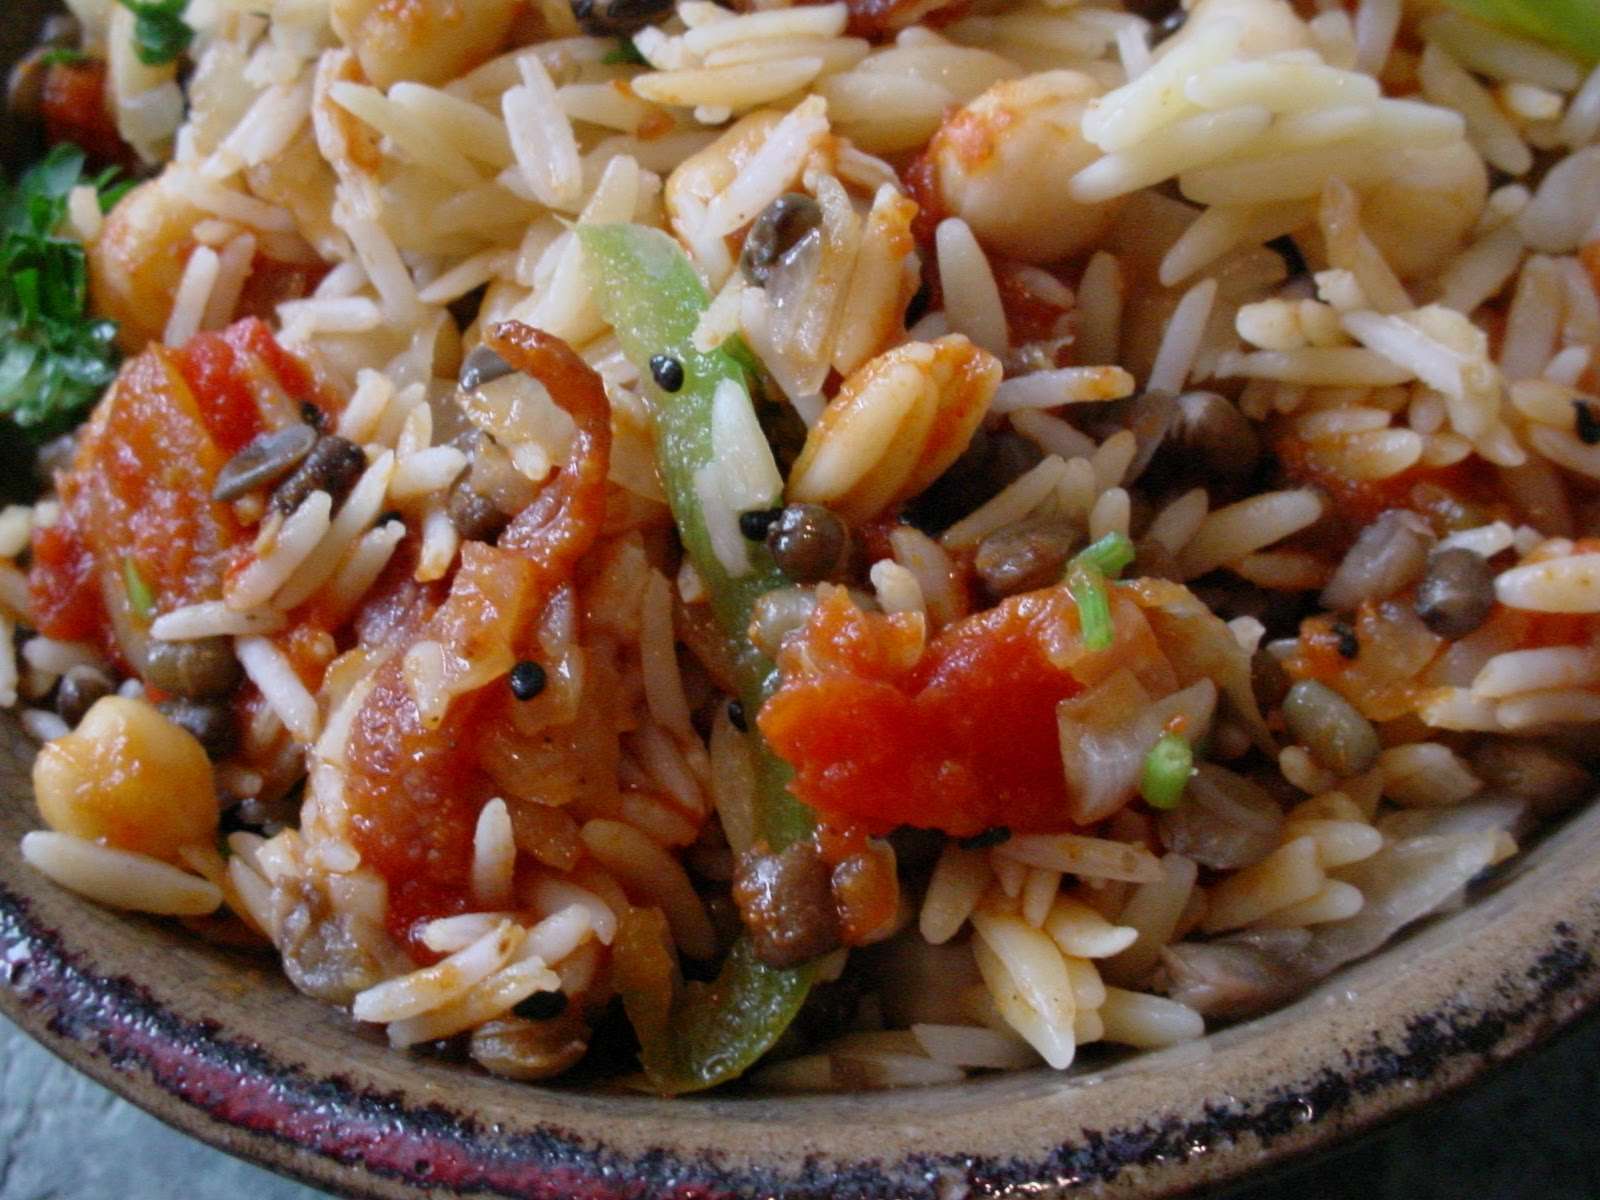 egyptian food koshari - photo #22